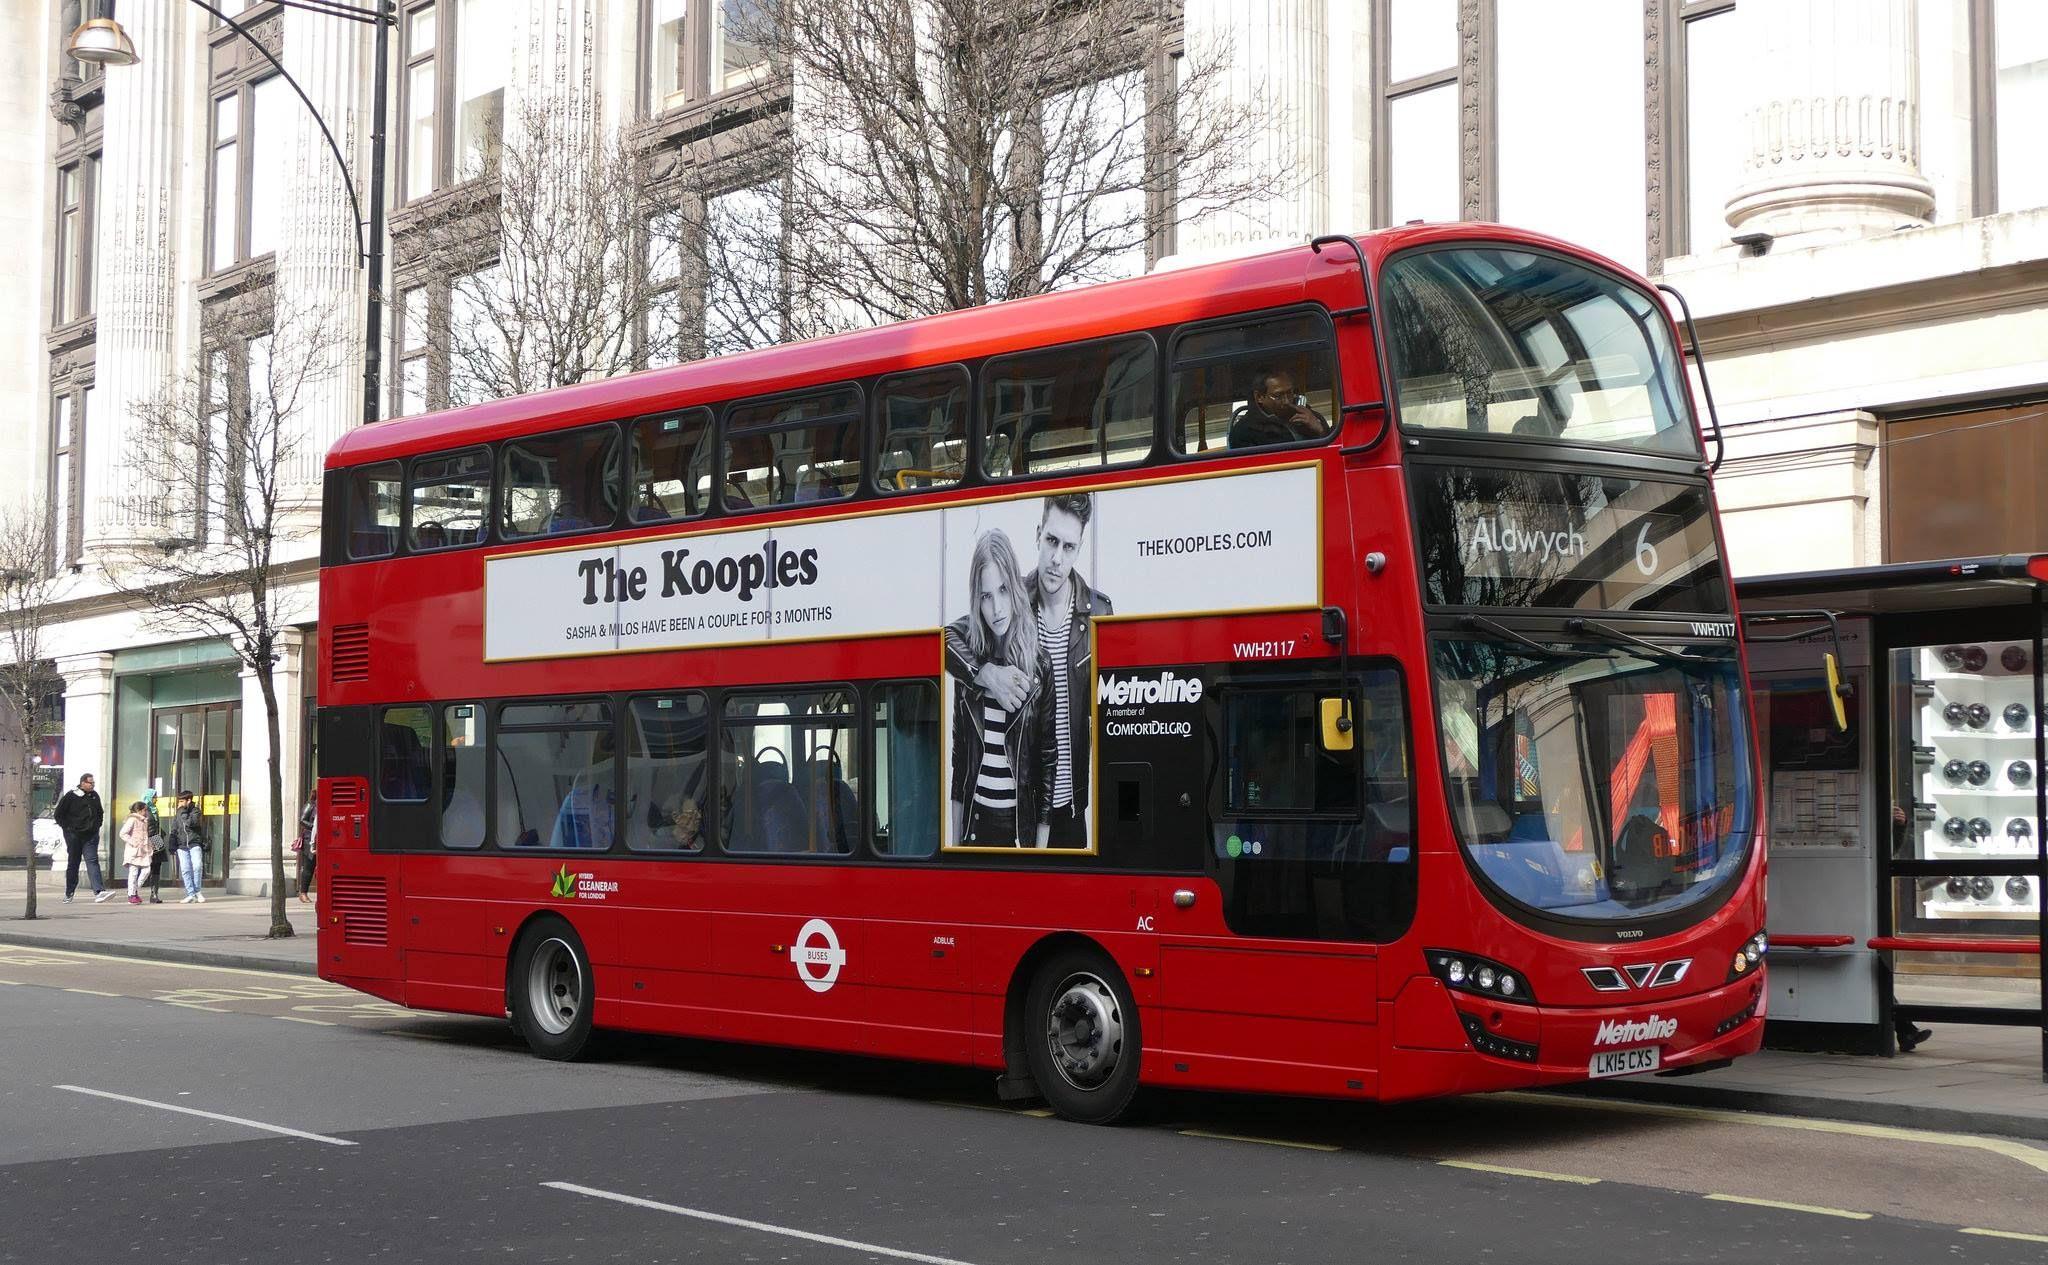 1556248 219567118394695 5396234092107232660 O Jpg 2048 1265 London Bus Bus Public Transport